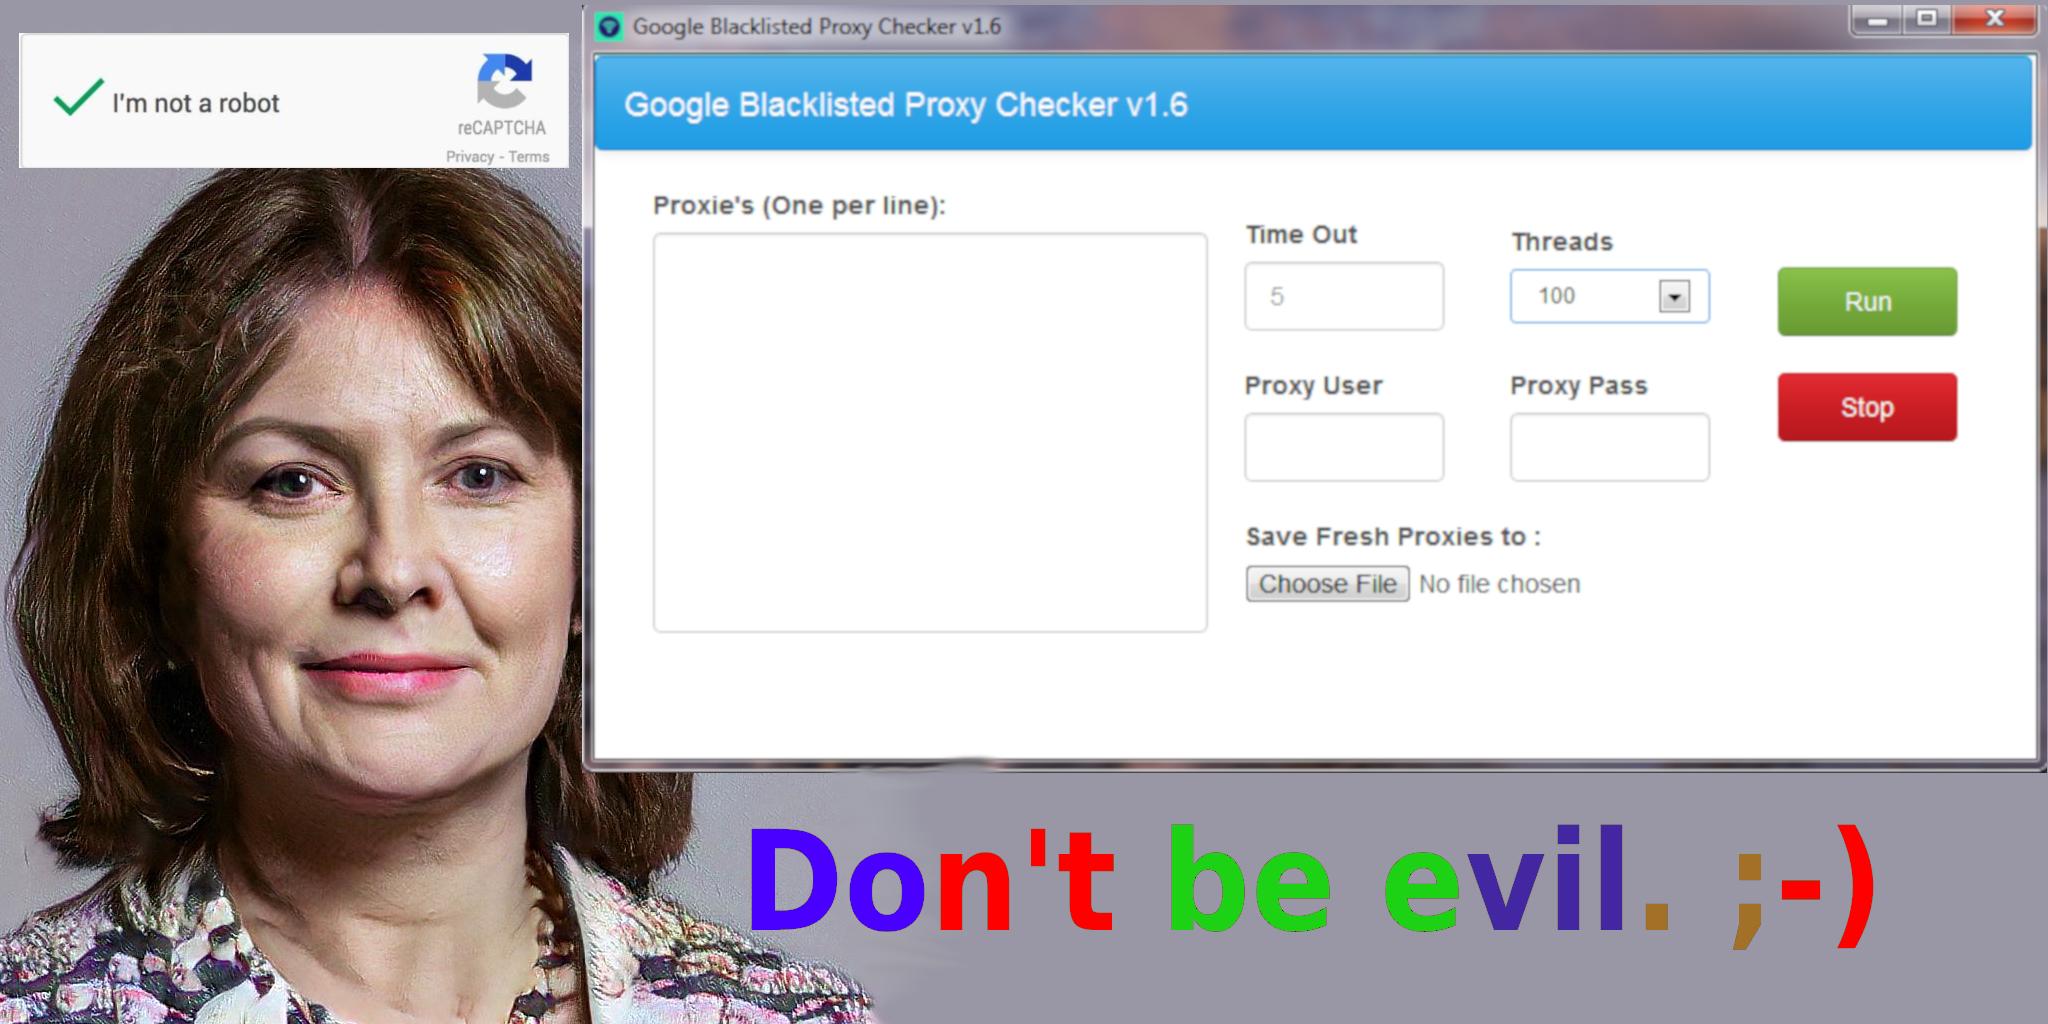 Google Blacklist Proxy Checker Bot